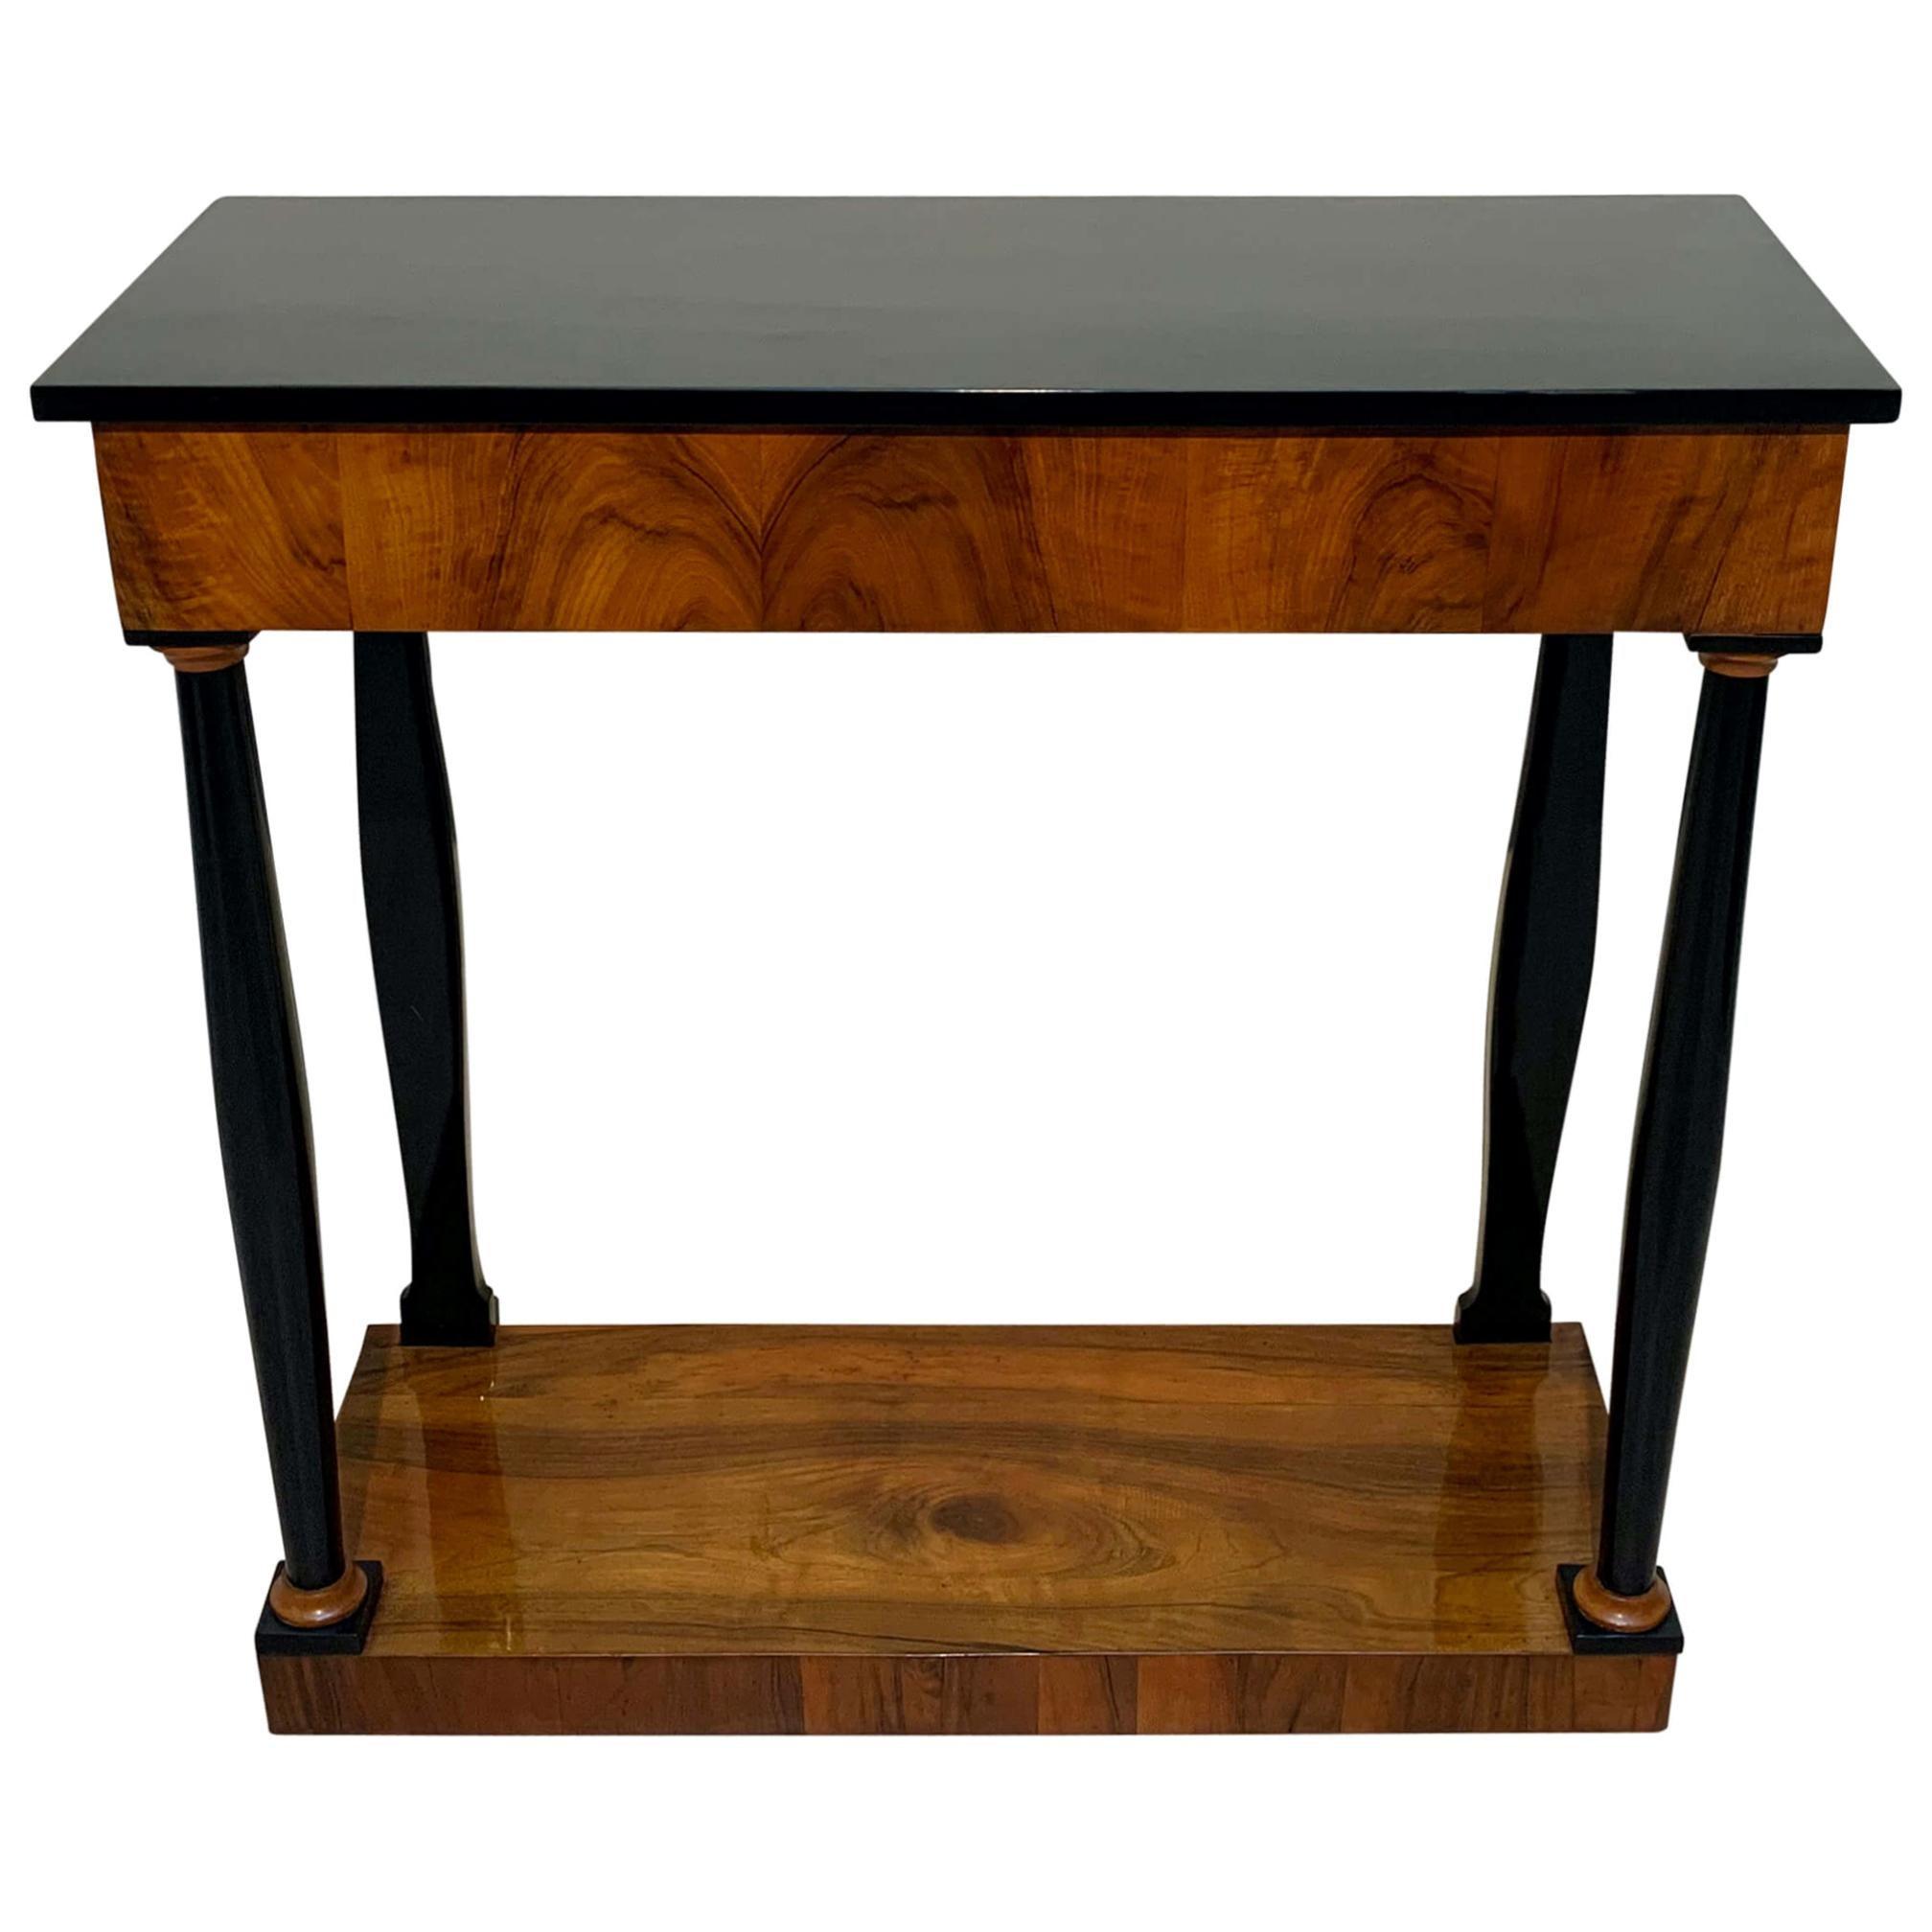 Neoclassical Biedermeier Console Table, Walnut Veneer, South Germany, circa 1820